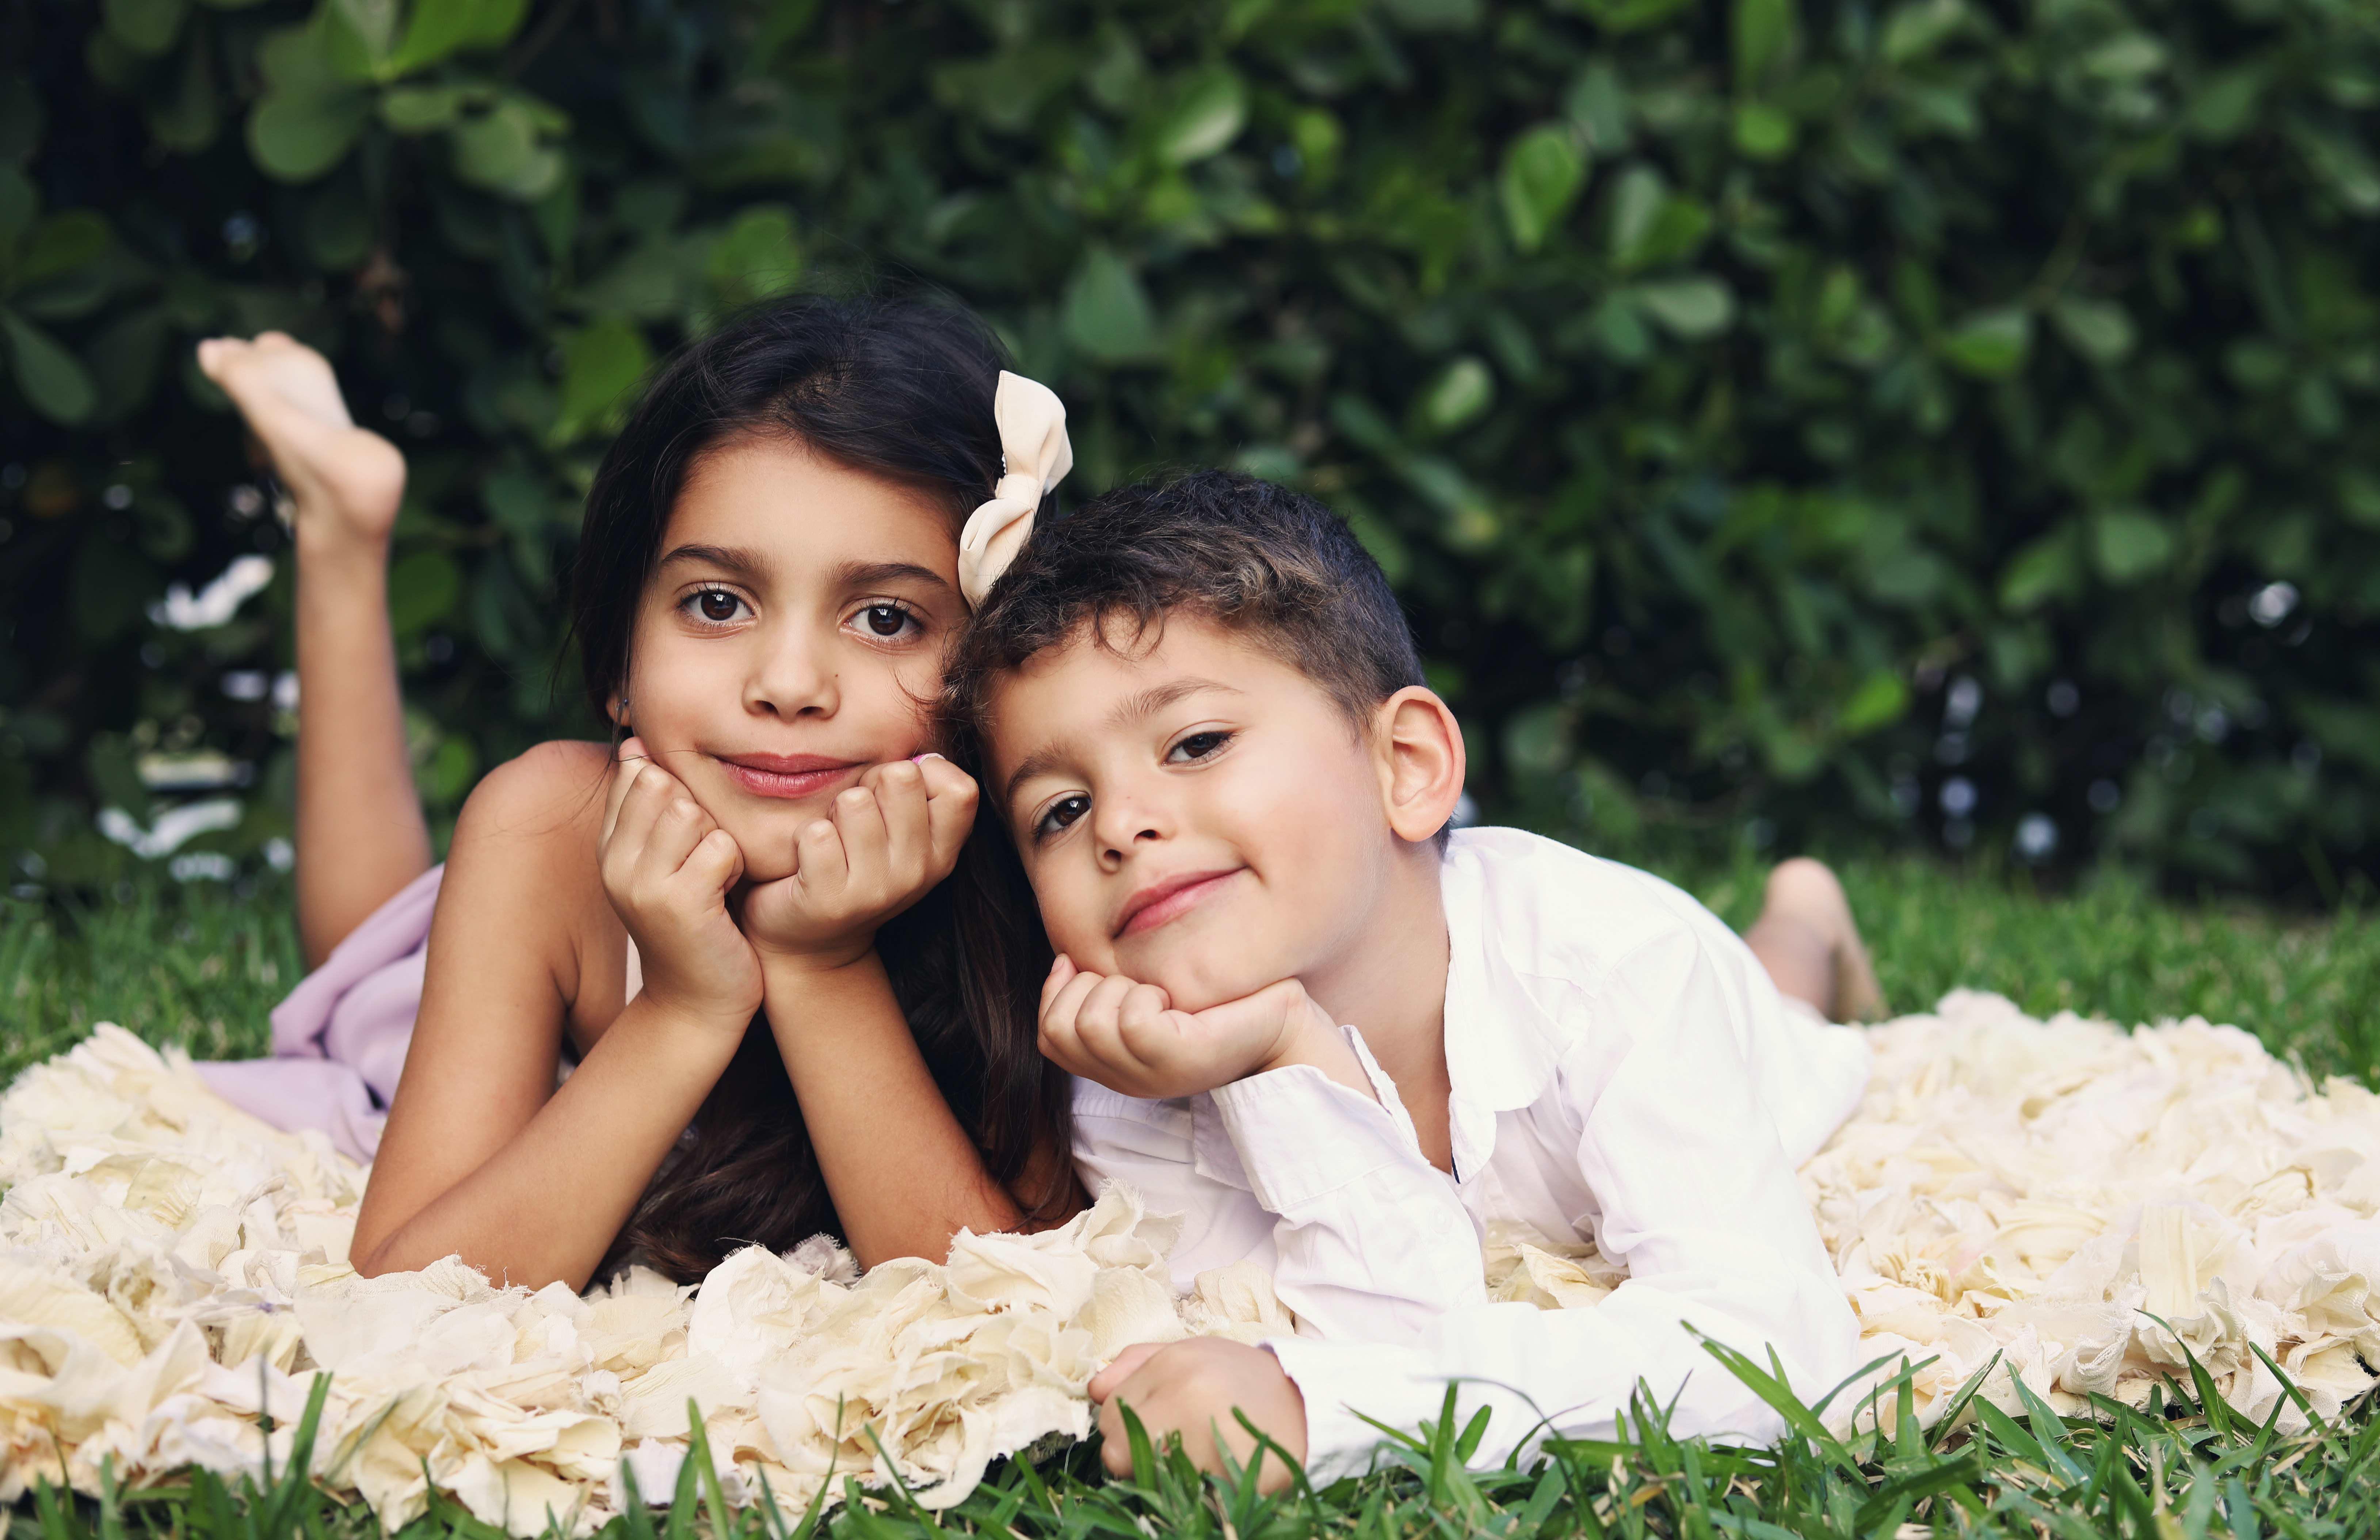 – 16 b family portrait photographer katherine eastman photography miami south florida birthday fairytale maternity newborn brickell